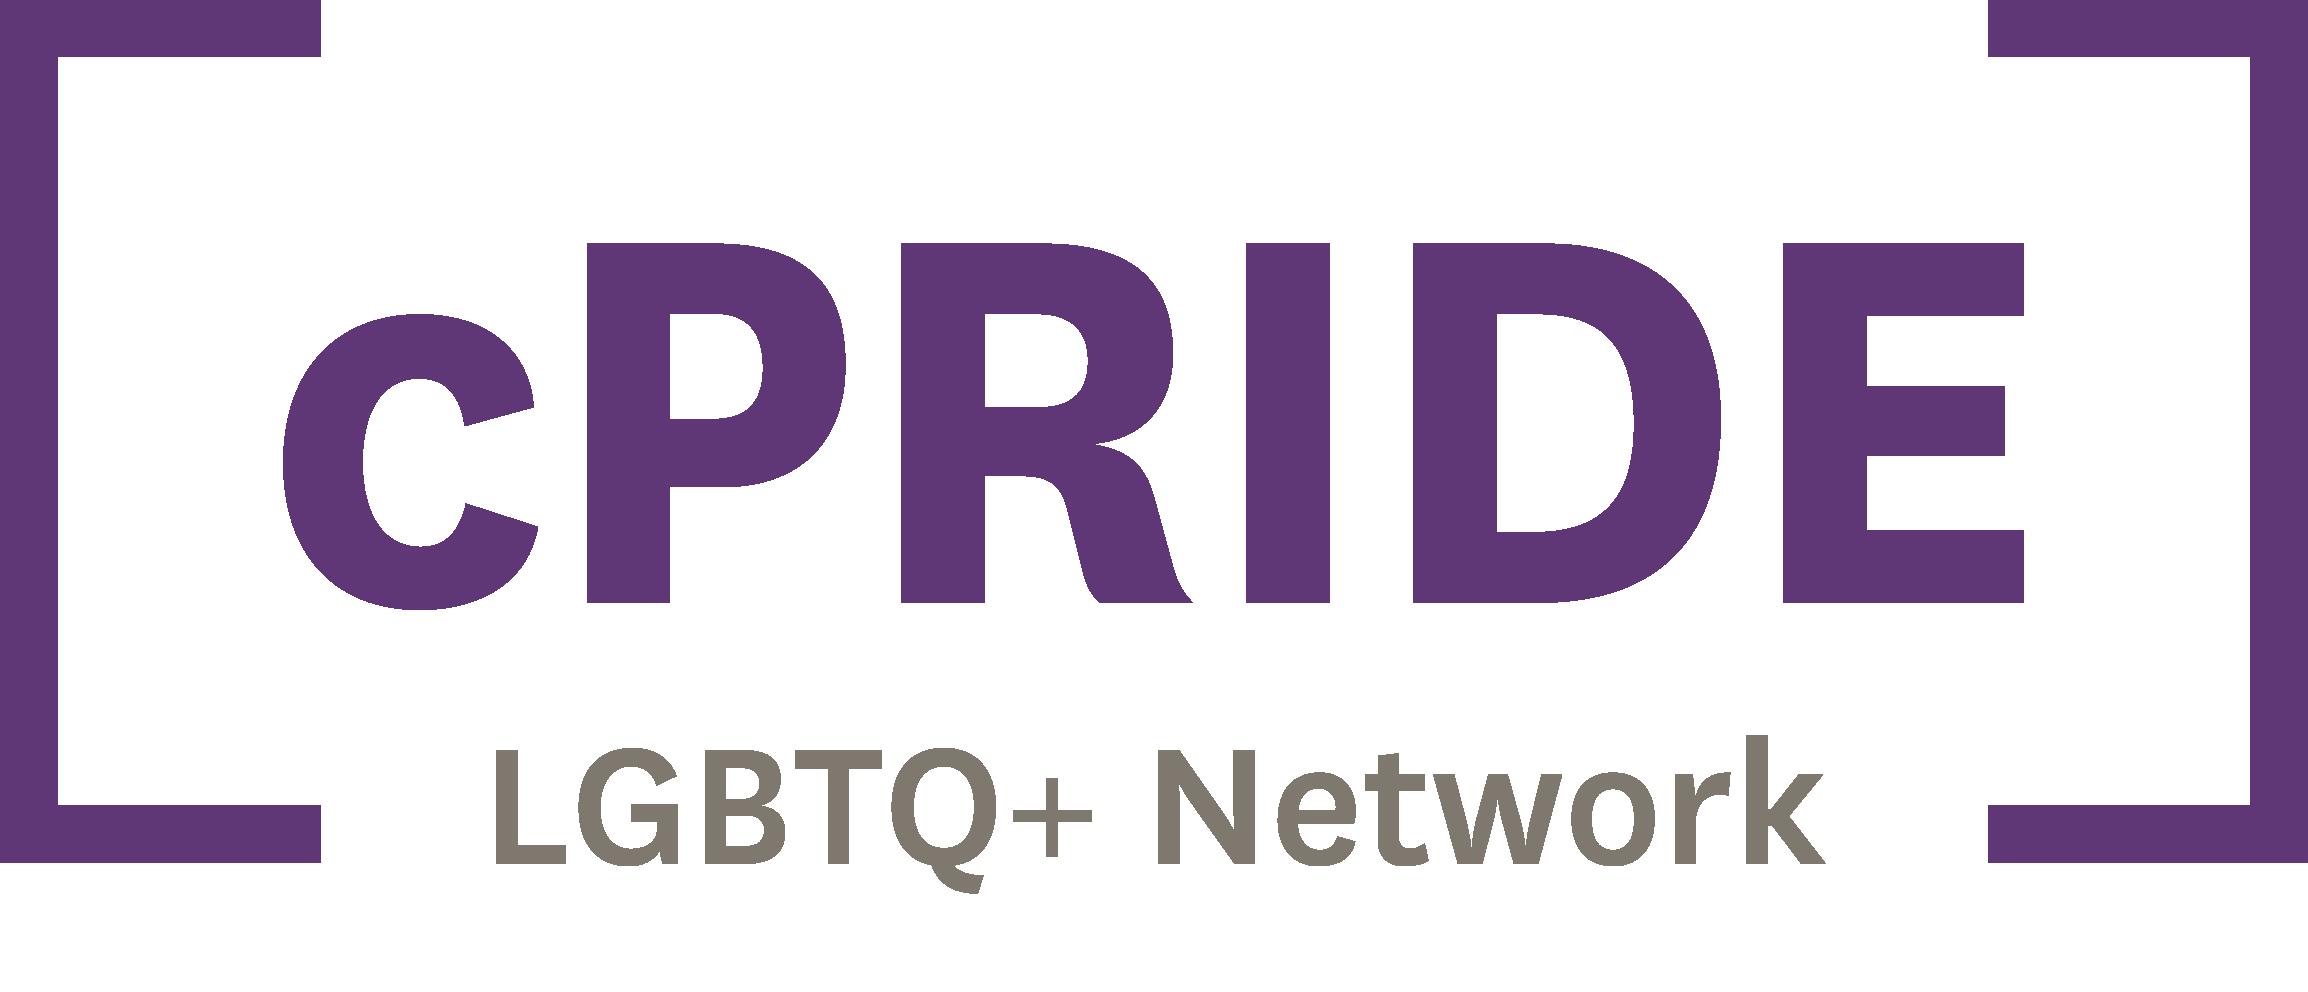 cPRIDE LGBTQ+ Network